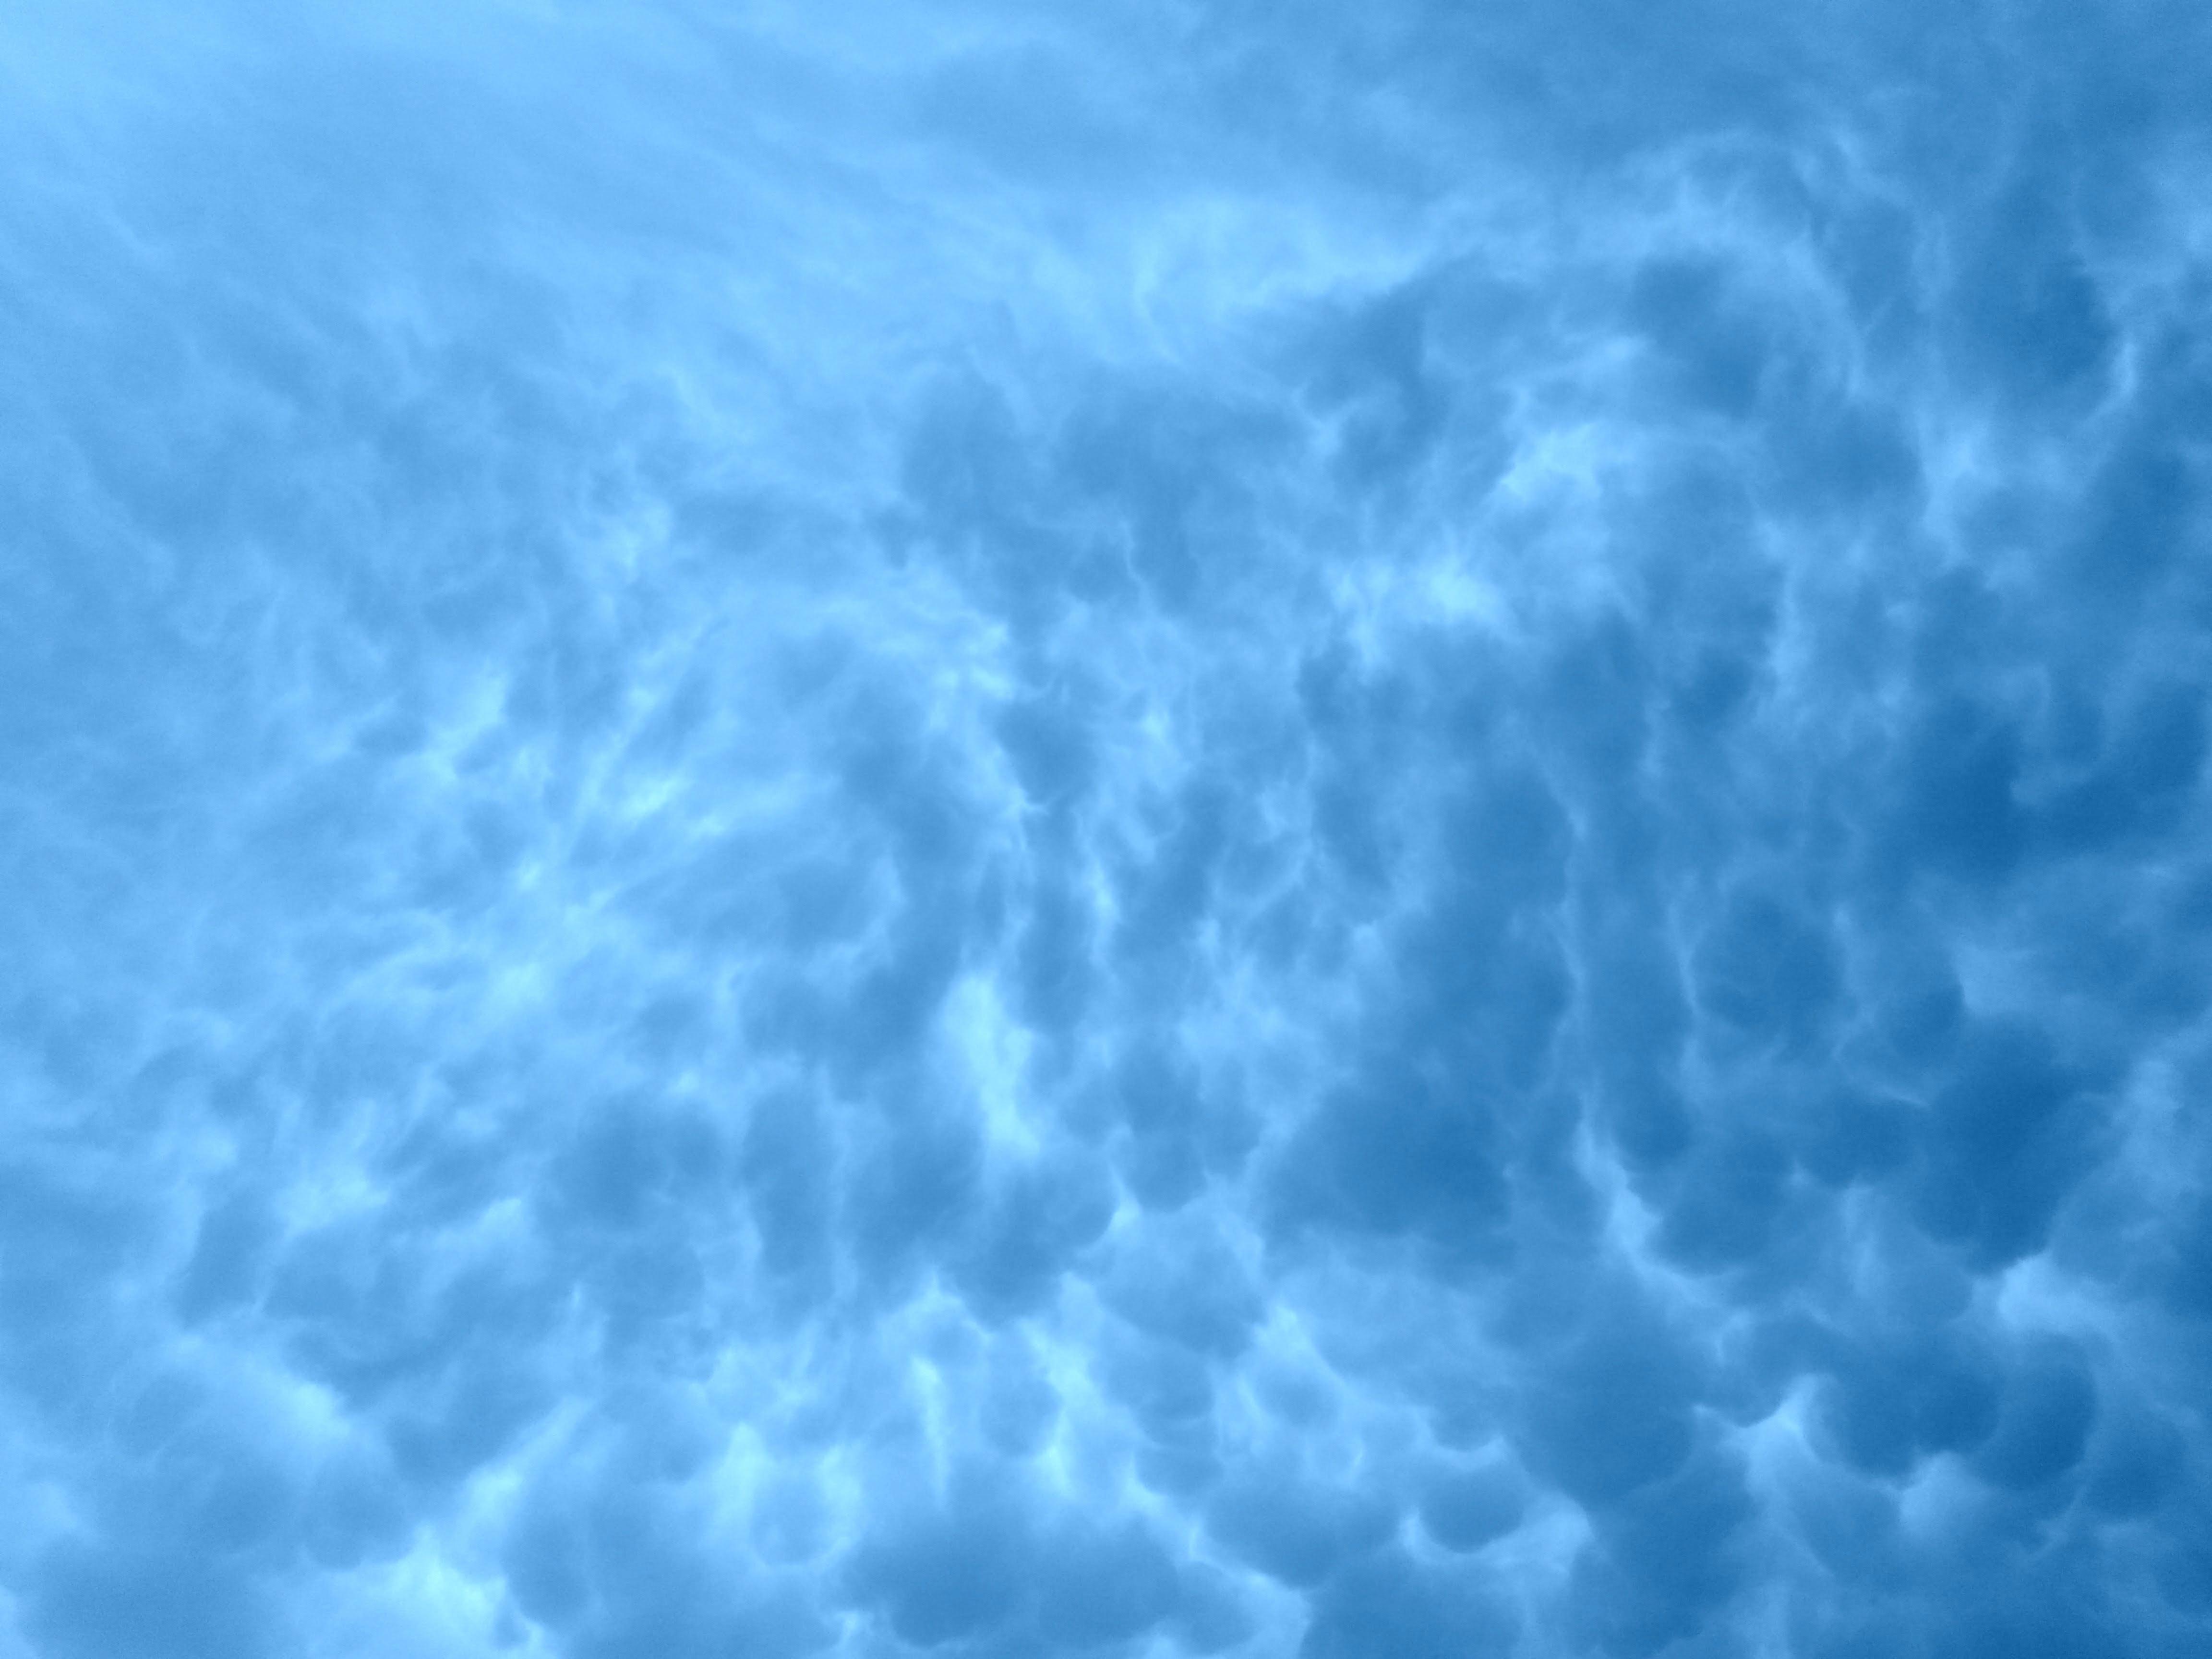 baggrund, blå, blå himmel